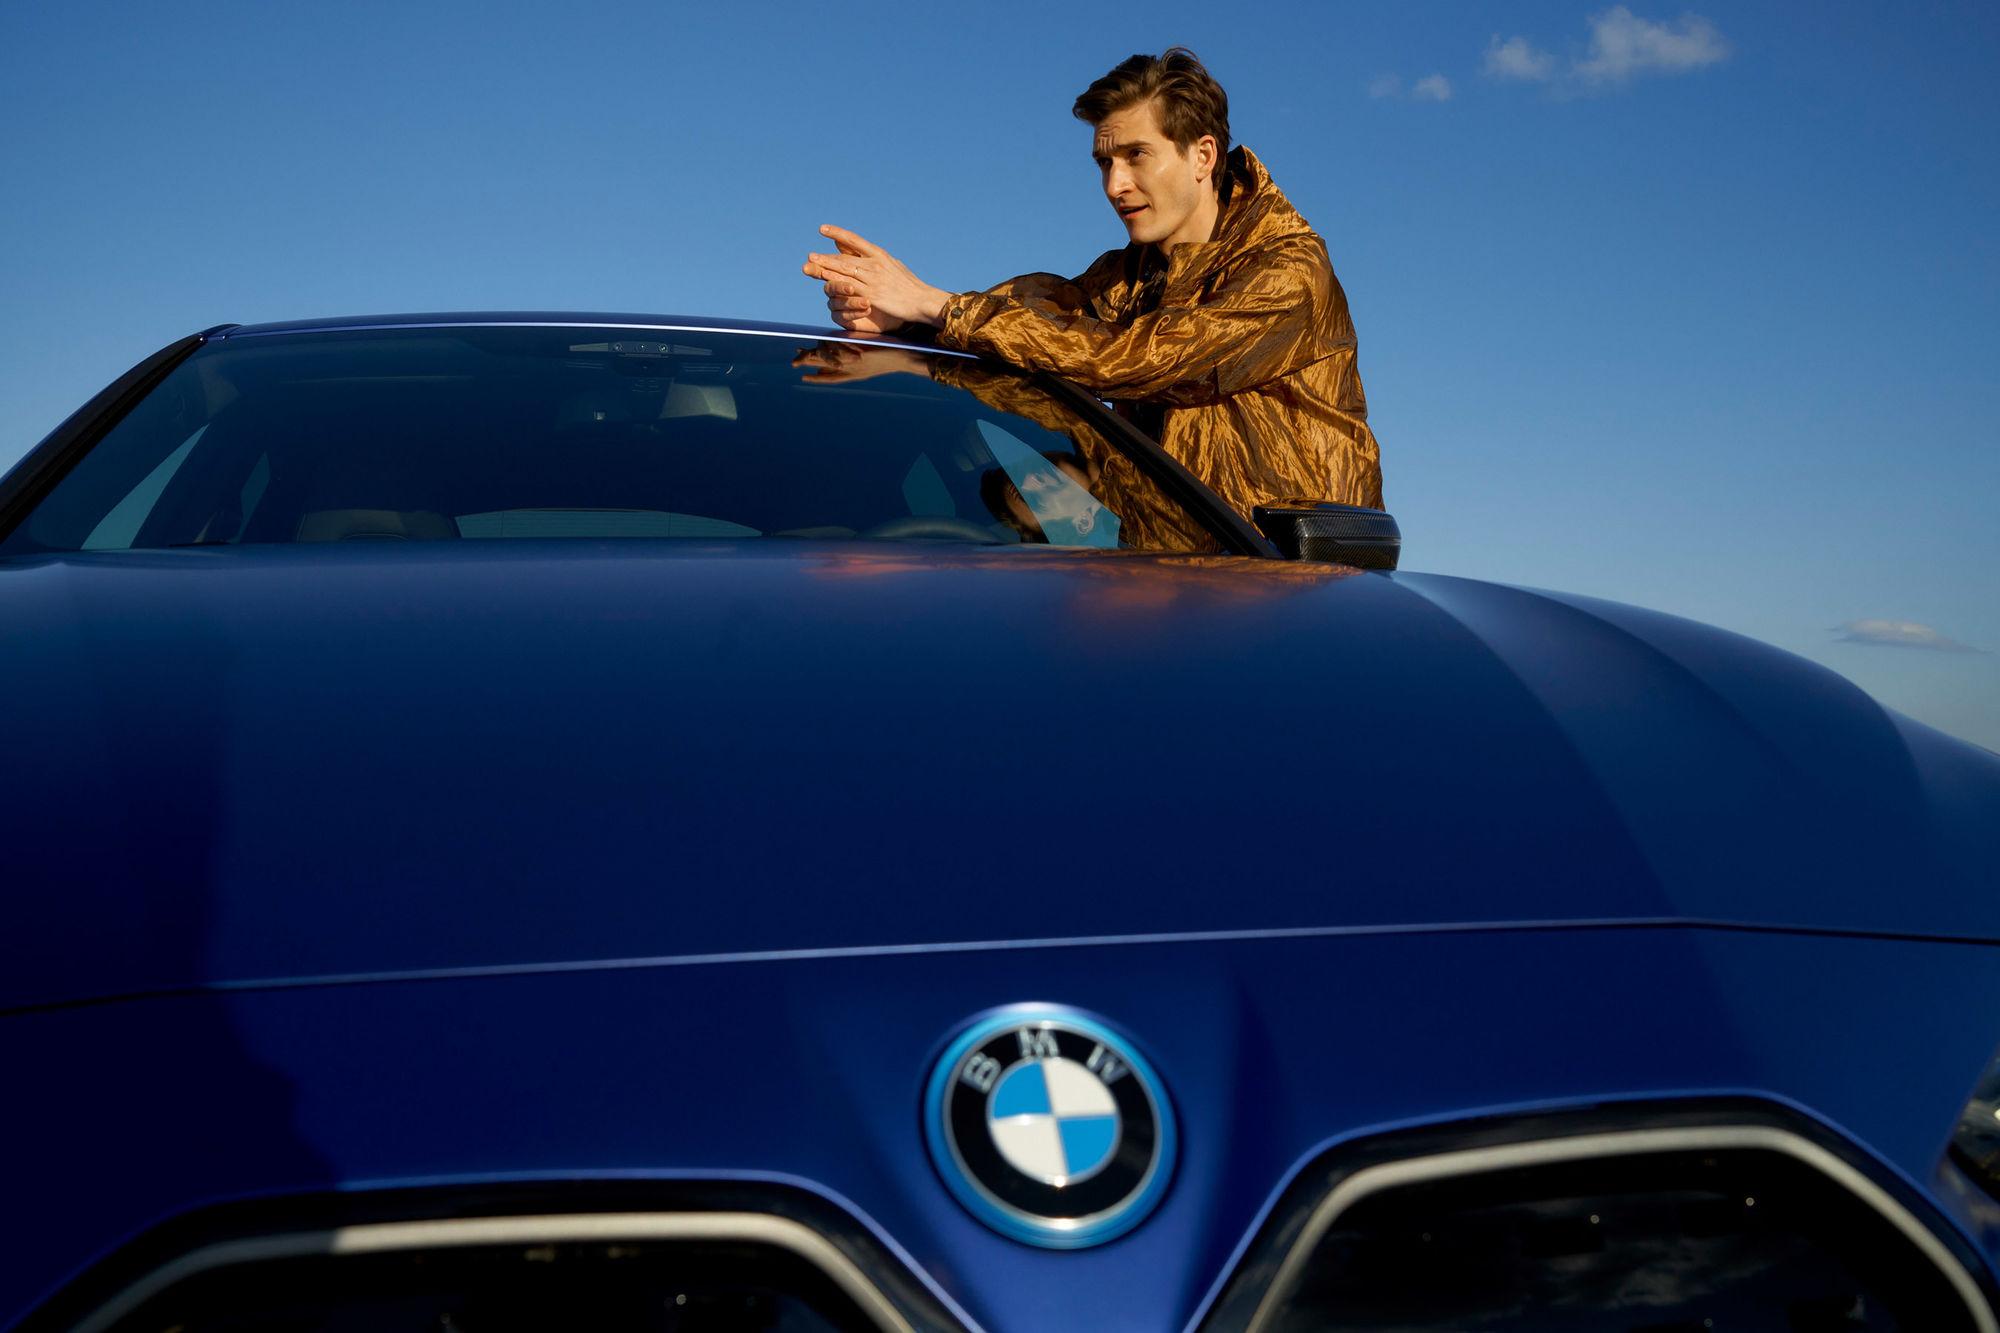 EMEIS DEUBEL: Lars Borges for BMW